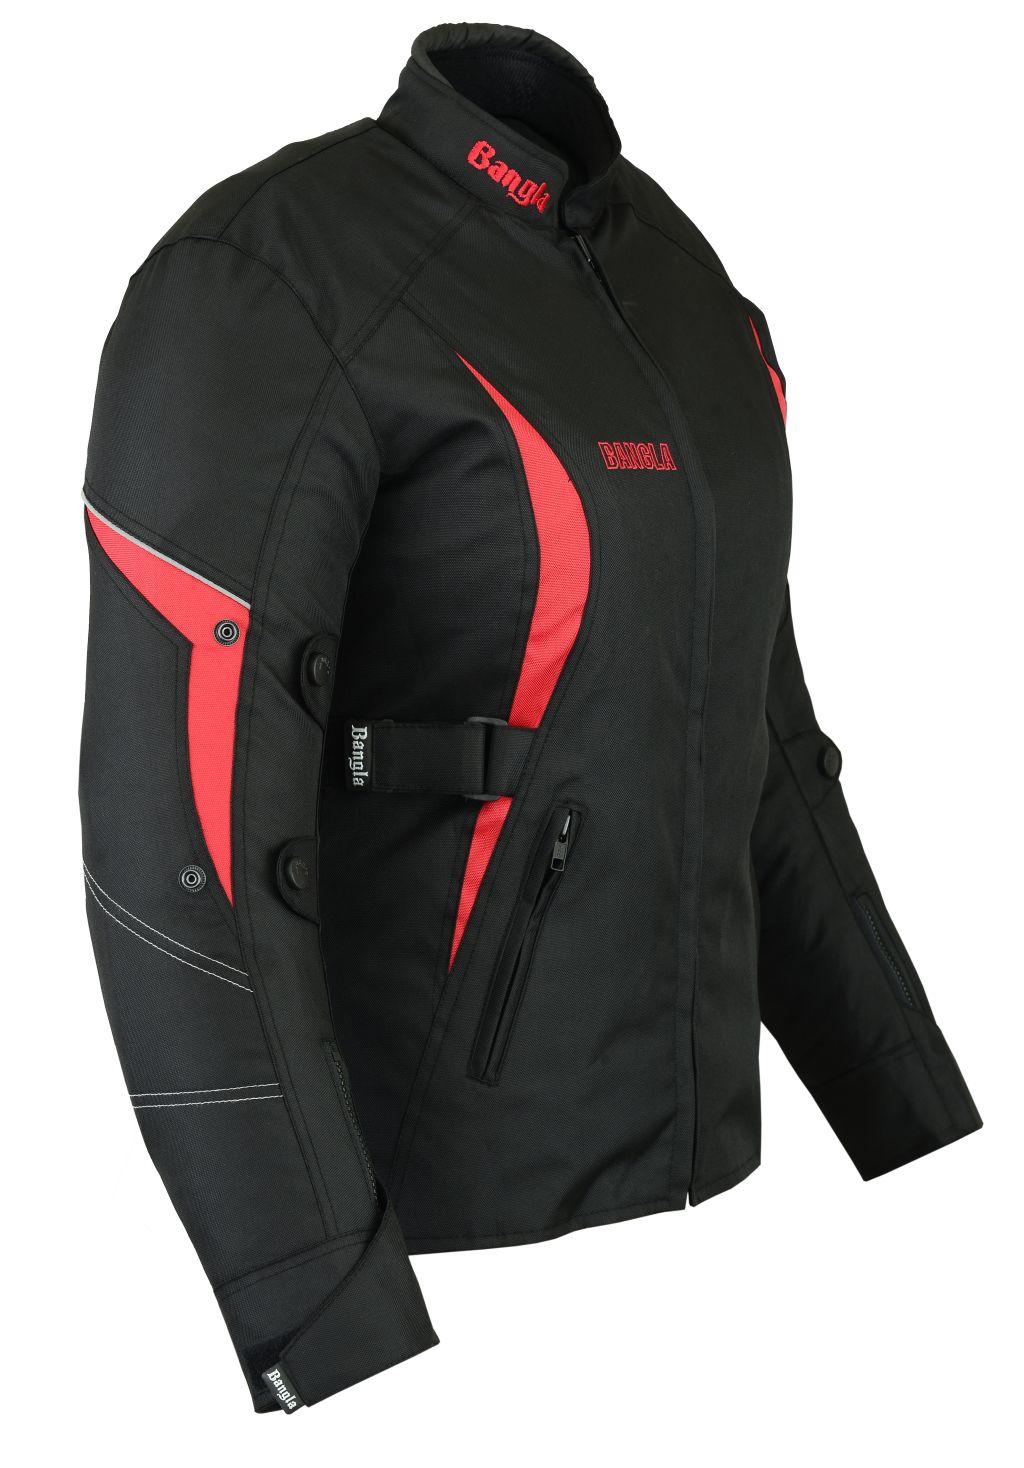 Motorradjacke Damen Textil Jacke Schwarz Rot Bangla S M L XL XXL XXXL